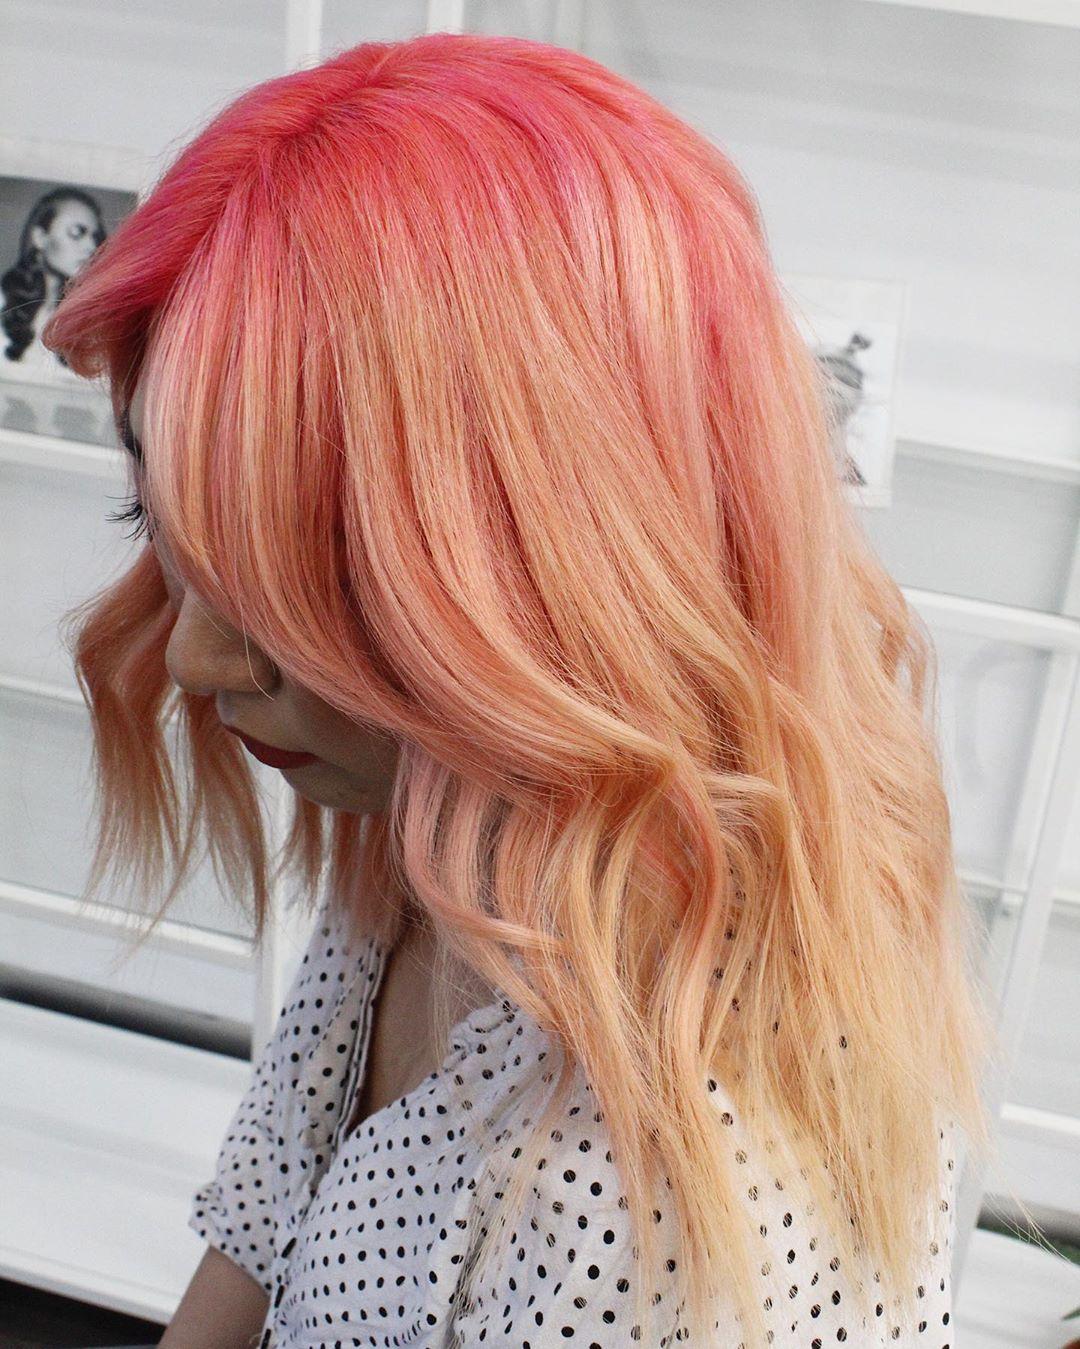 Temporary Semi-Permanent Hair Dye Cream